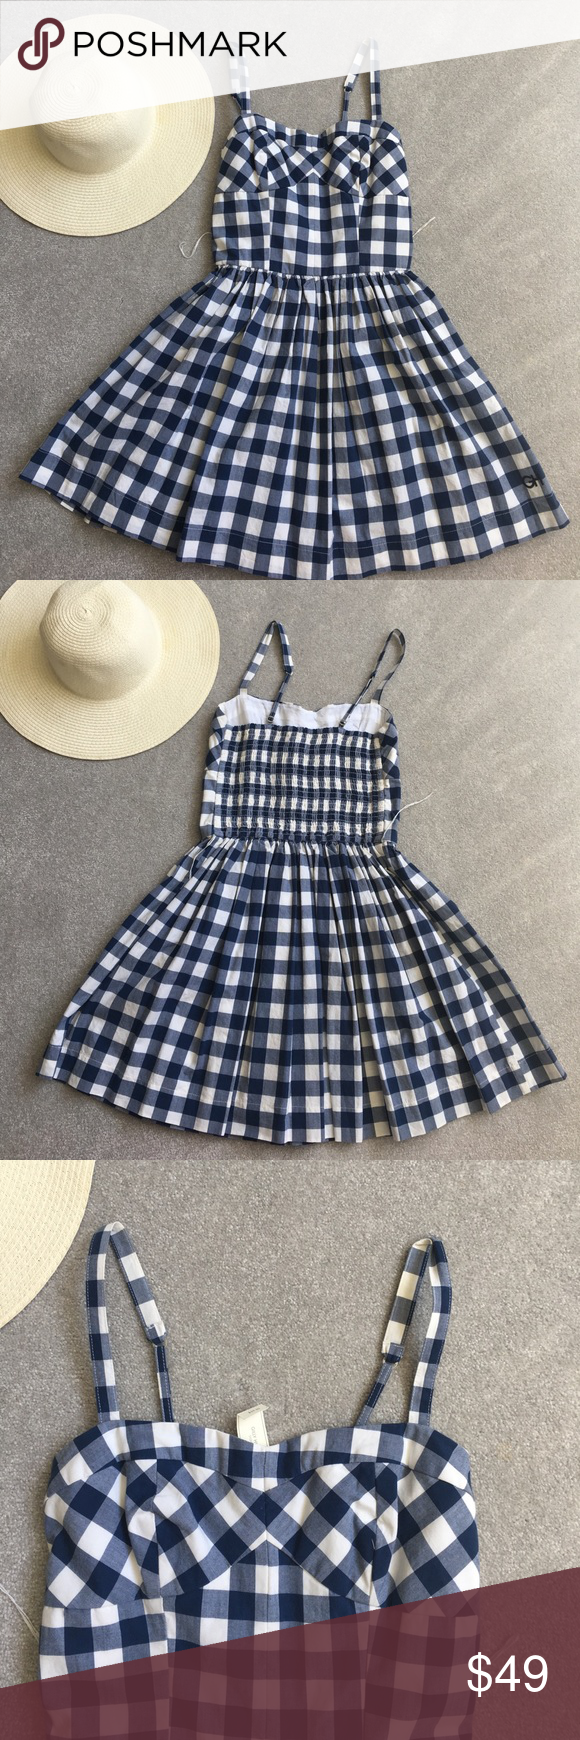 NWT Gilly Hicks Gingham Summer Dress - Medium NWT gingham print summer dress! So beautiful and perfect for the summer! 100% Cotton. Medium Gilly Hicks Dresses Mini